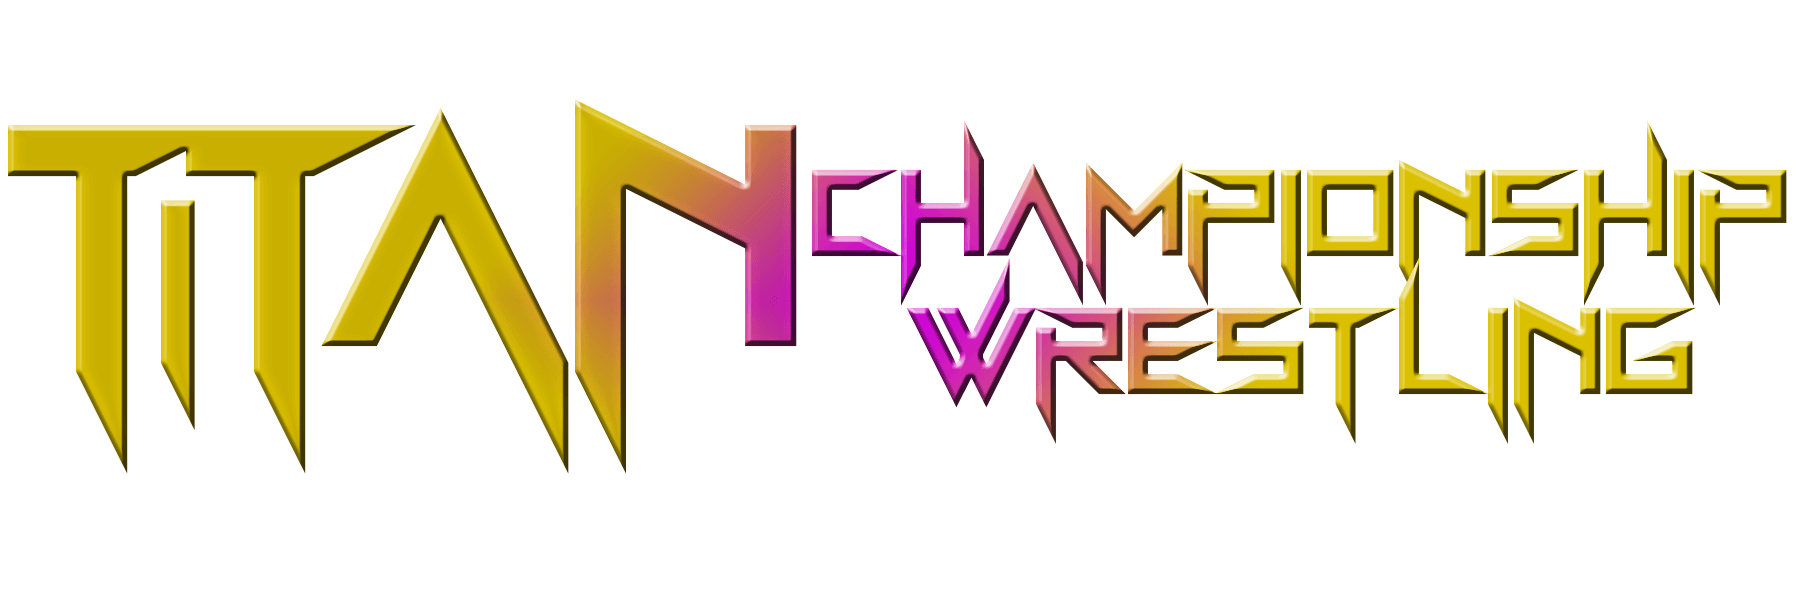 Titan Championship Wrestling - Family Friendly Wrestling Entertainment